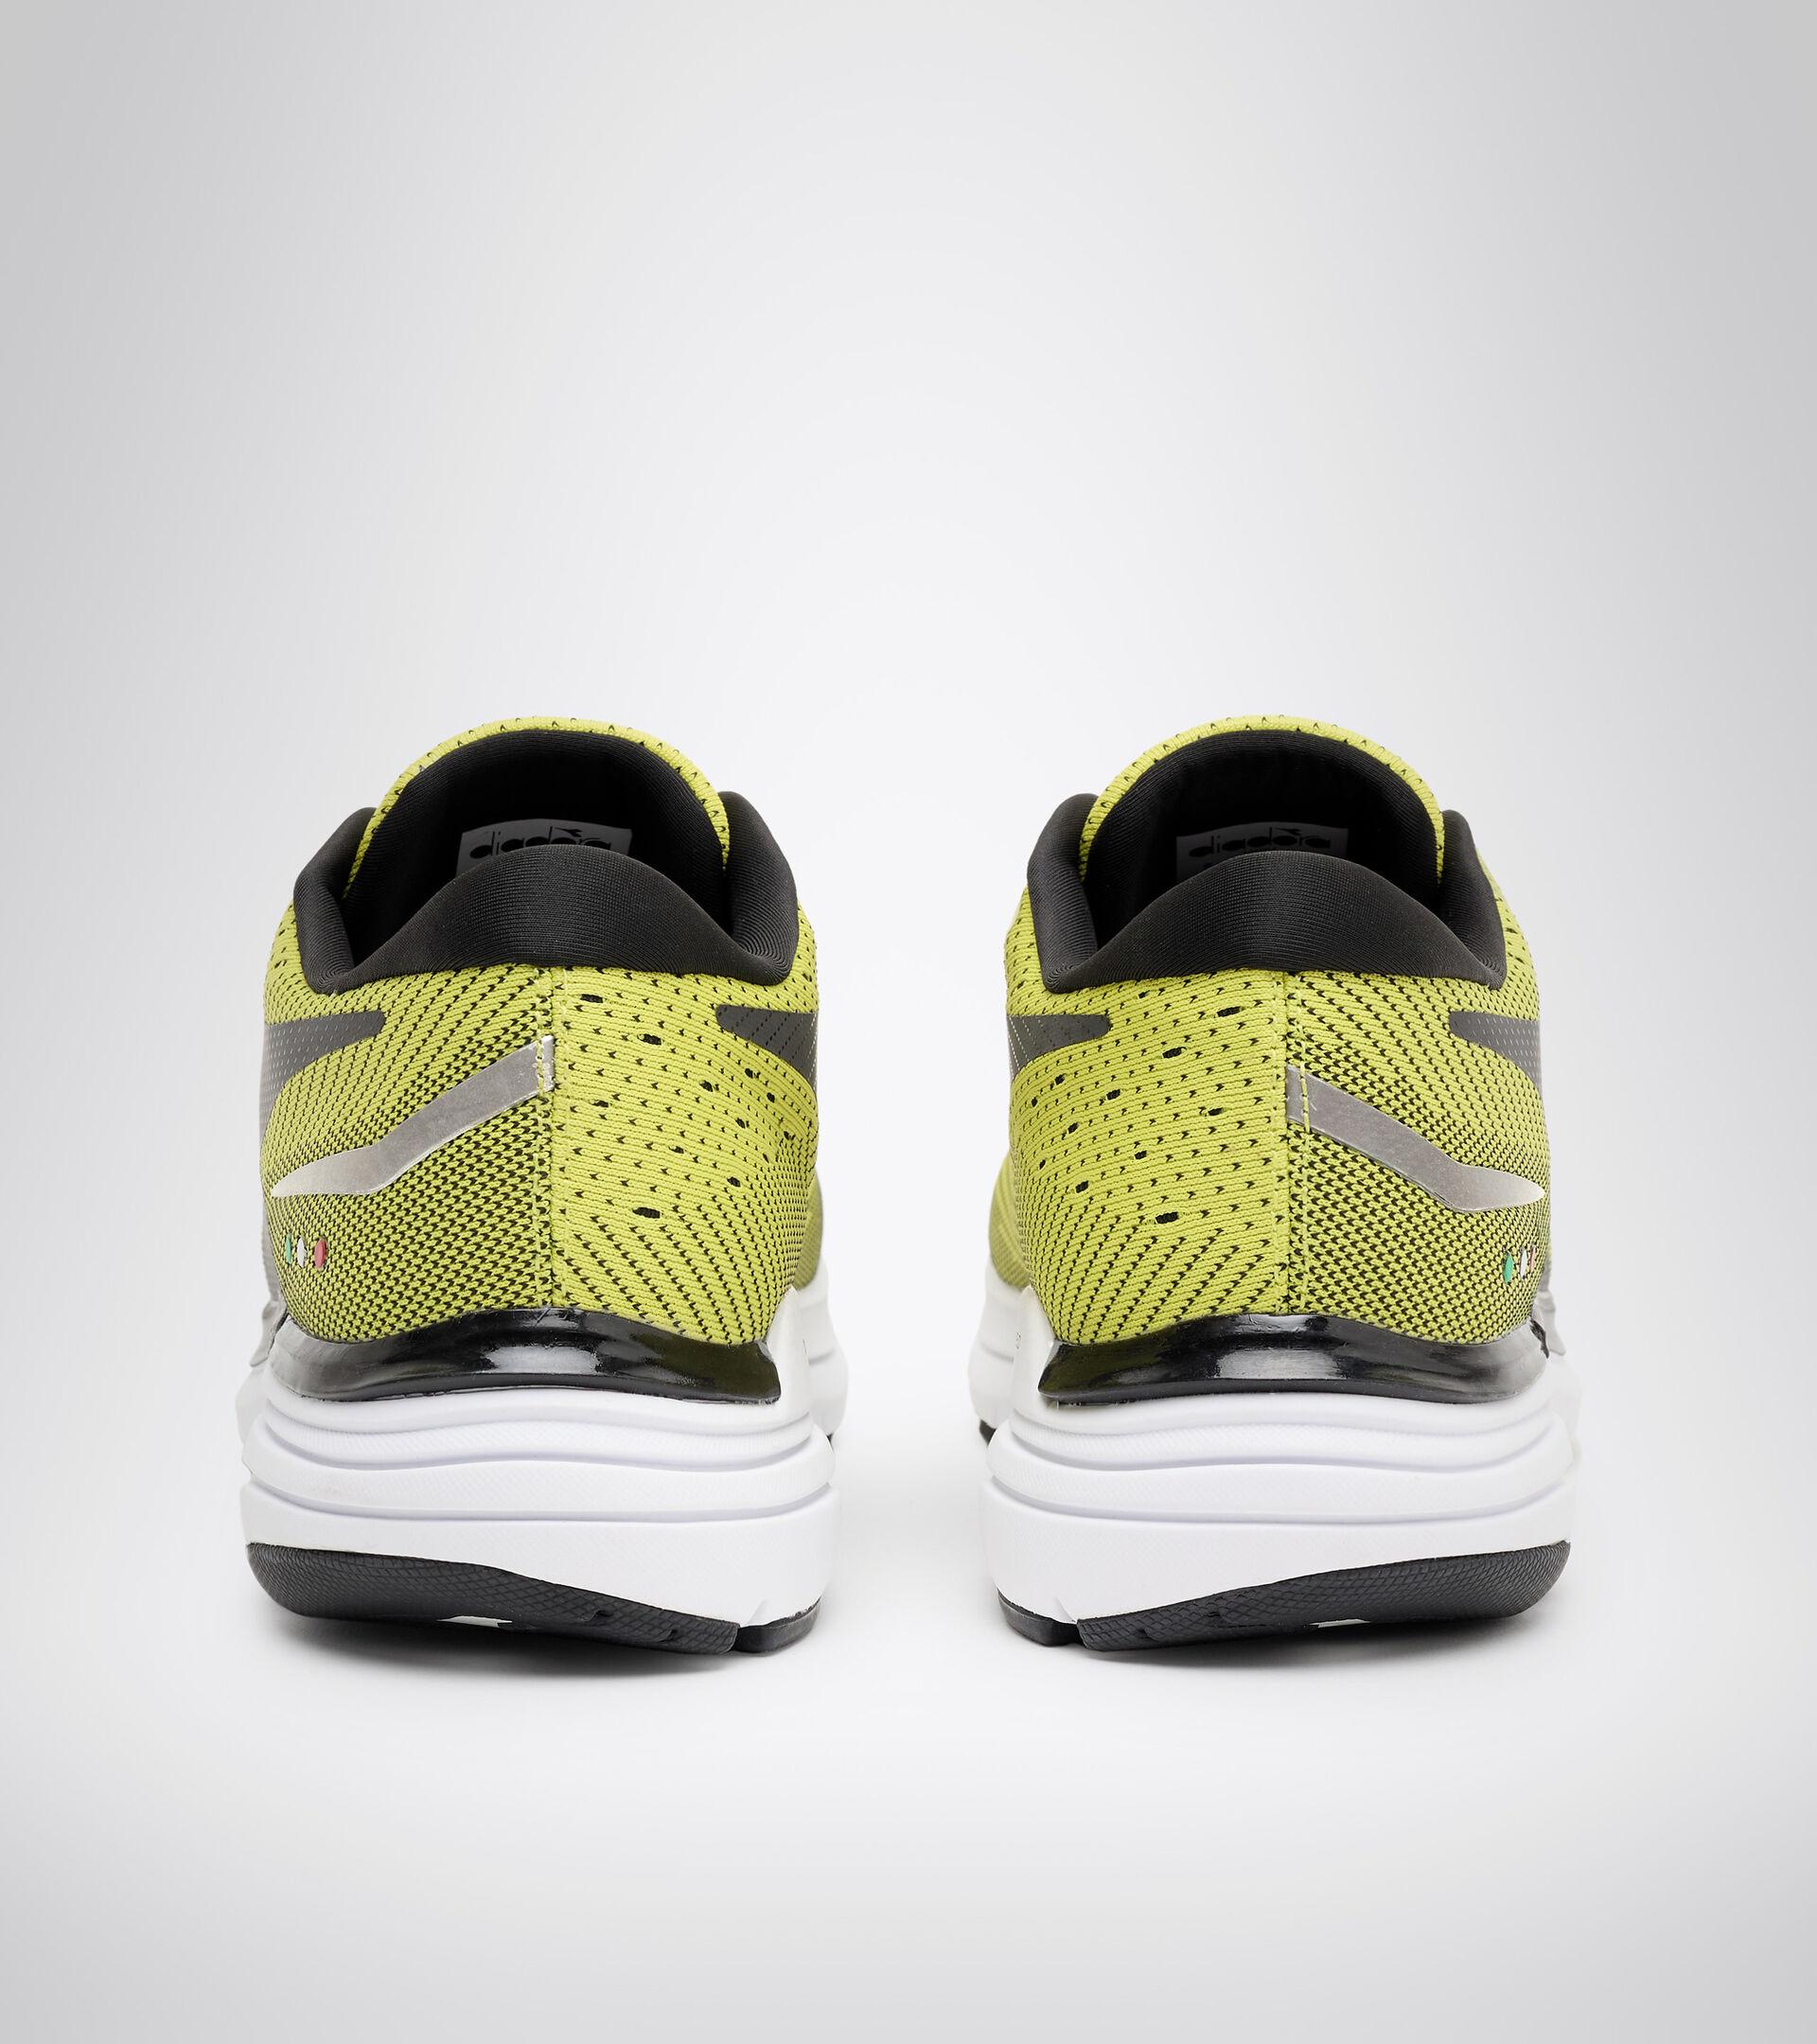 Chaussures de running - Homme MYTHOS BLUSHIELD 6 SOURCES SULFUREUSES/NOIR/BLANC - Diadora